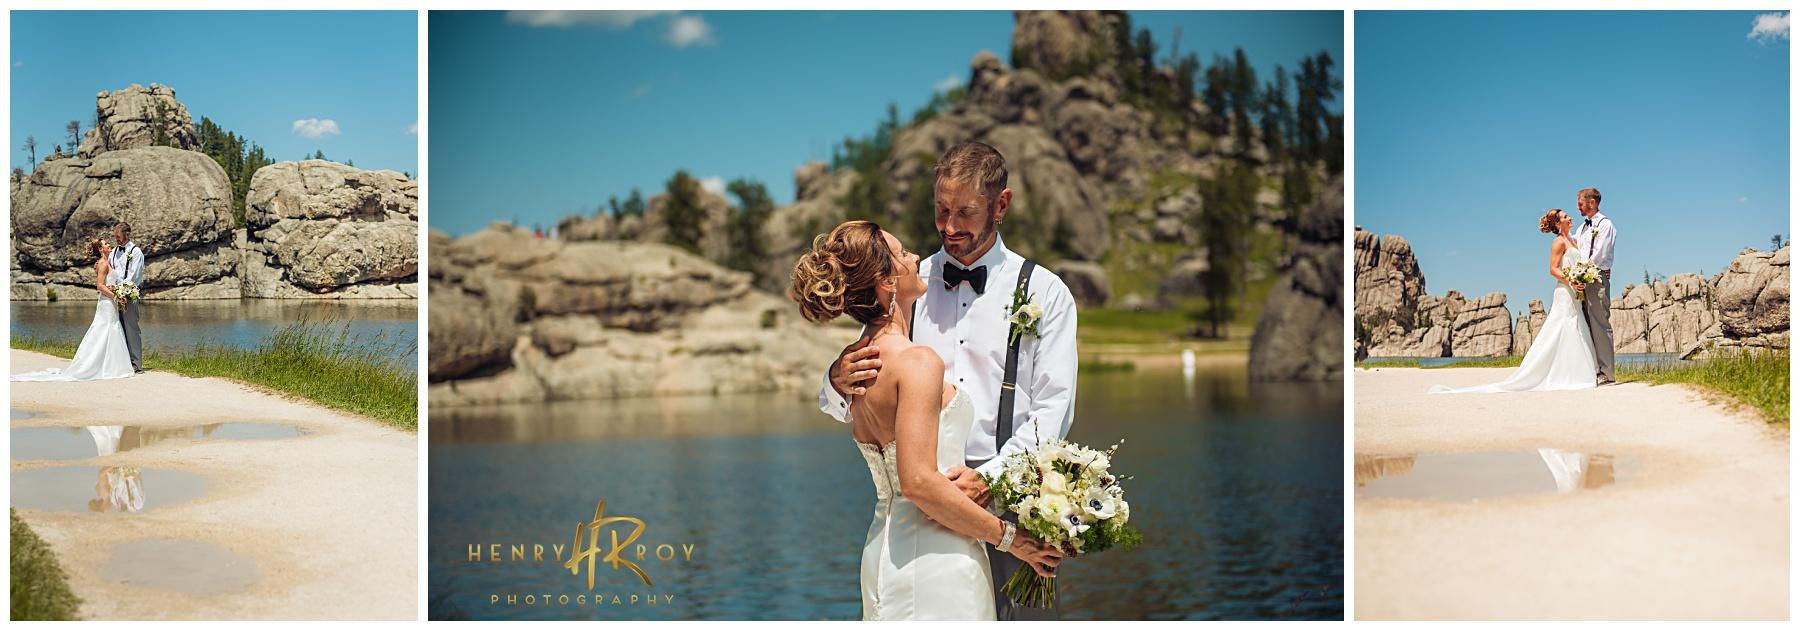 Wedding Photographer024.jpg